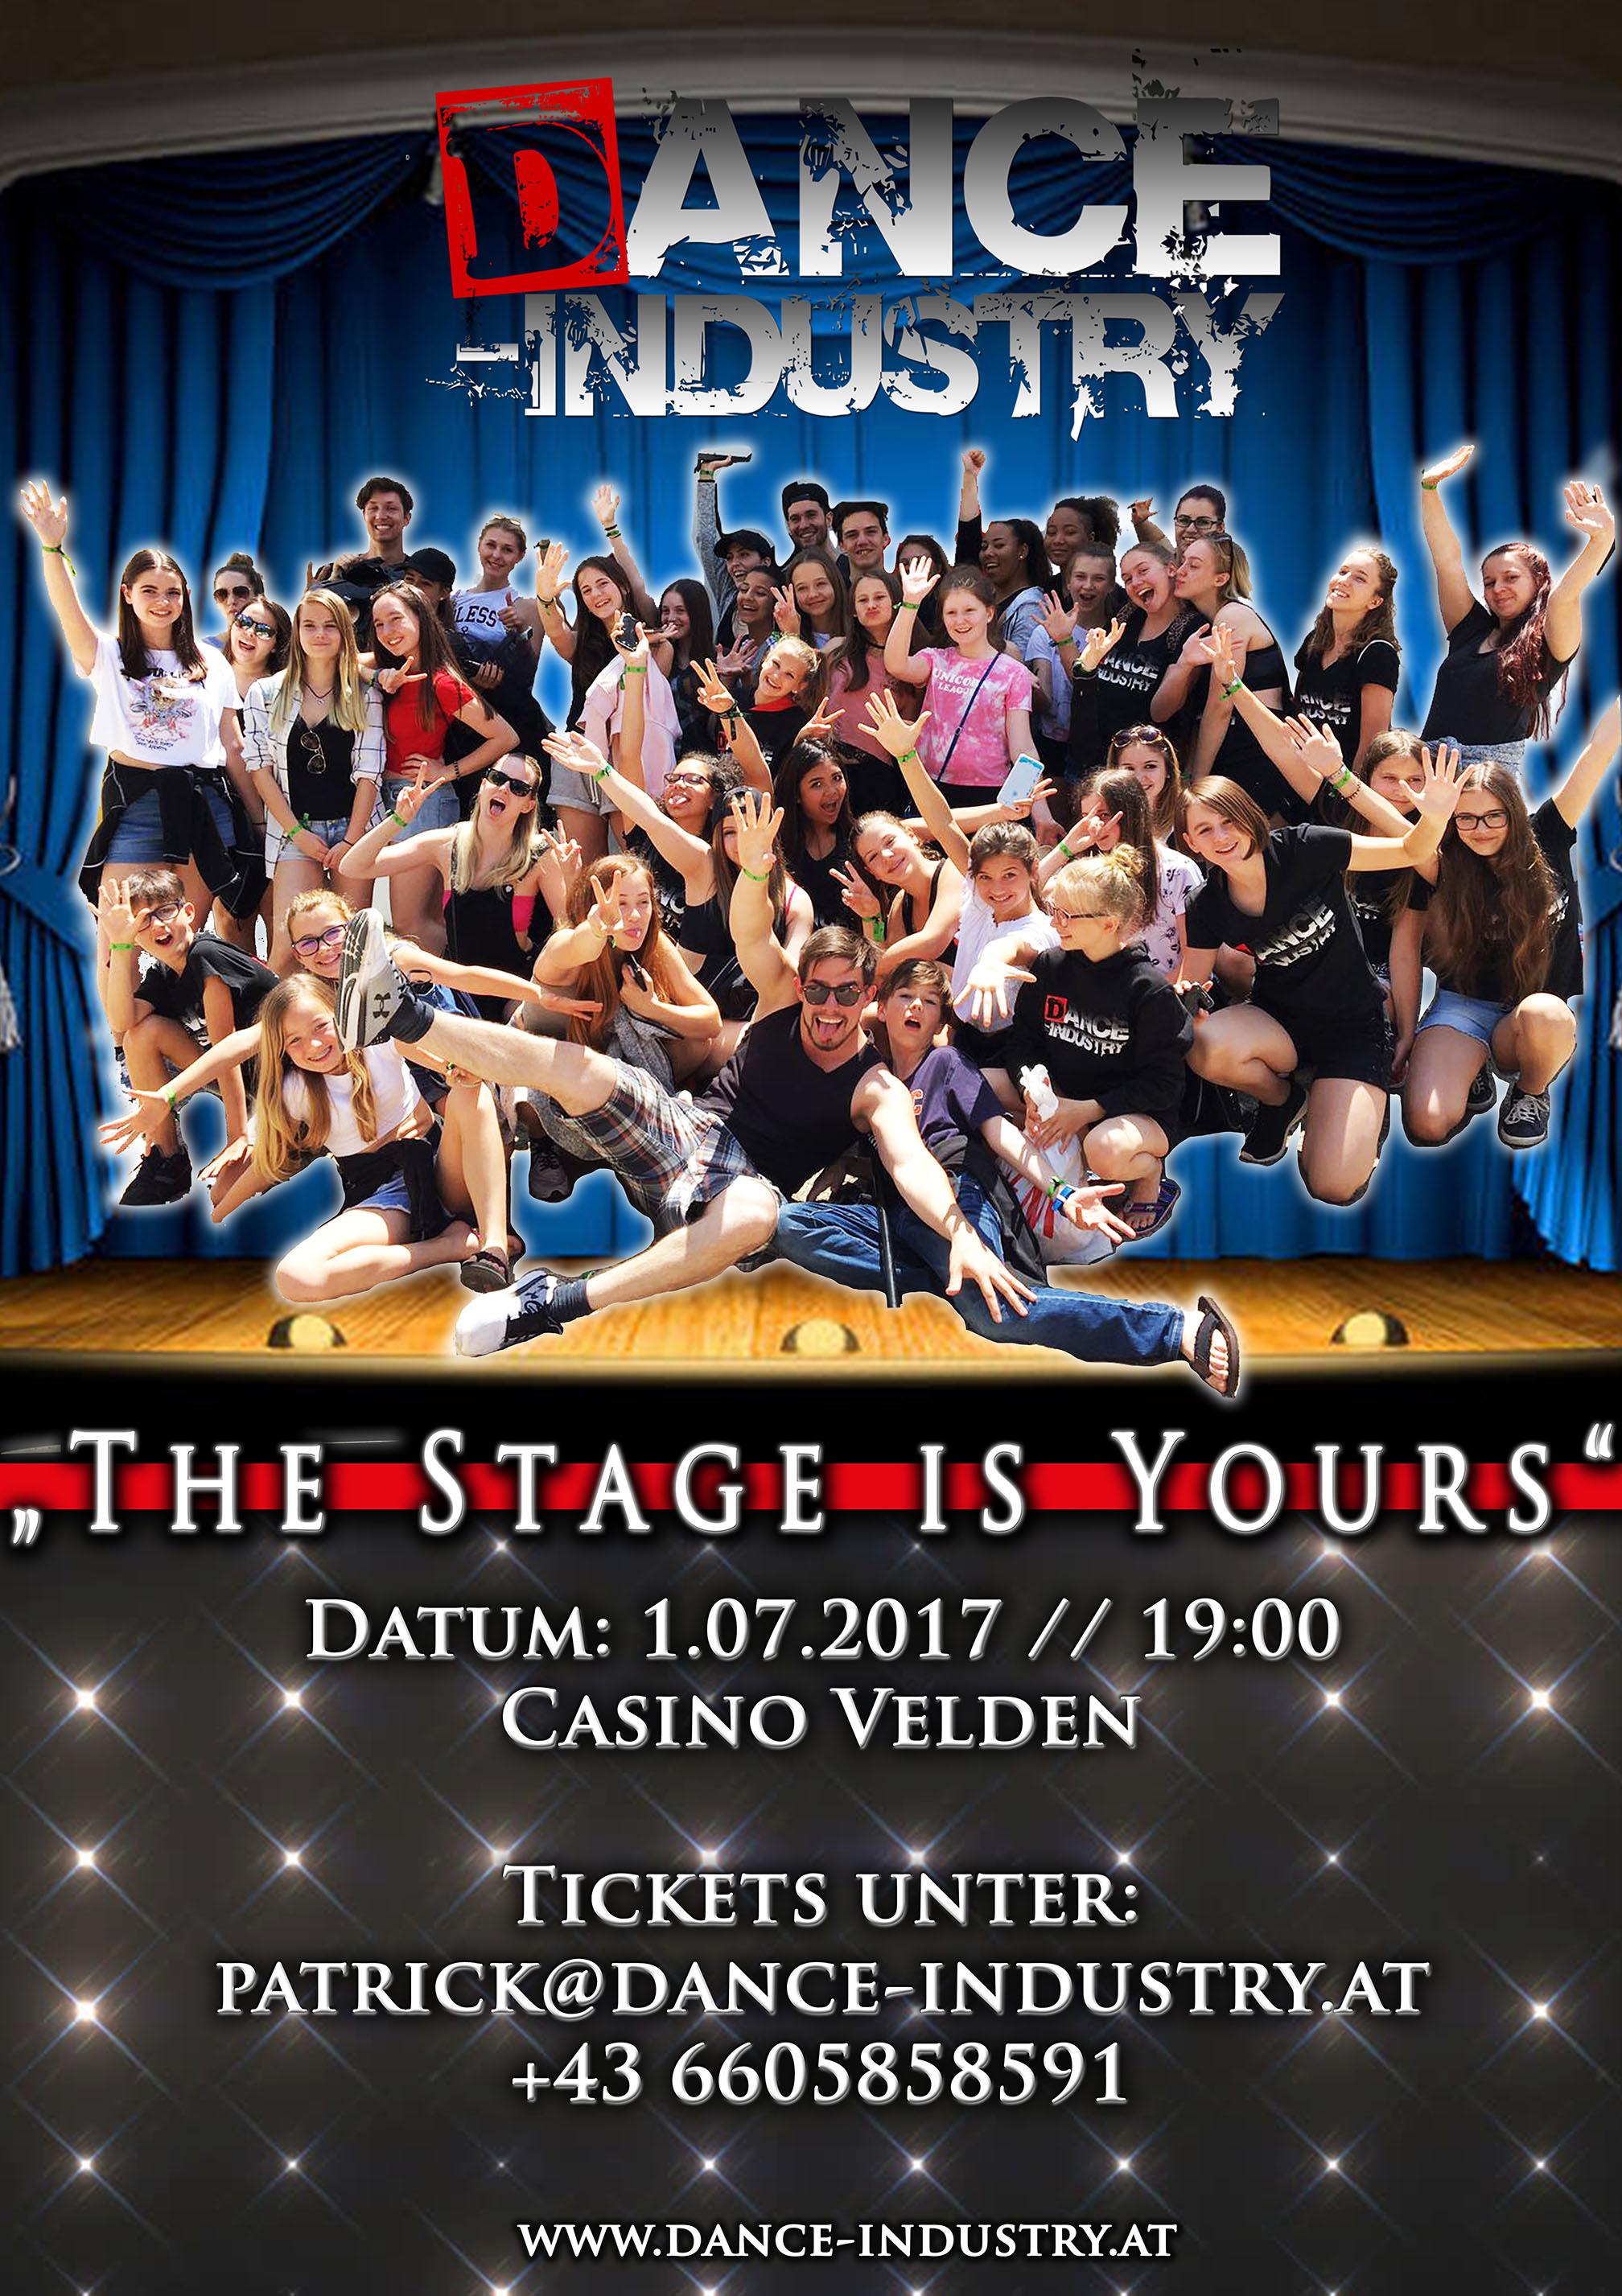 Stageisyours_fertig2